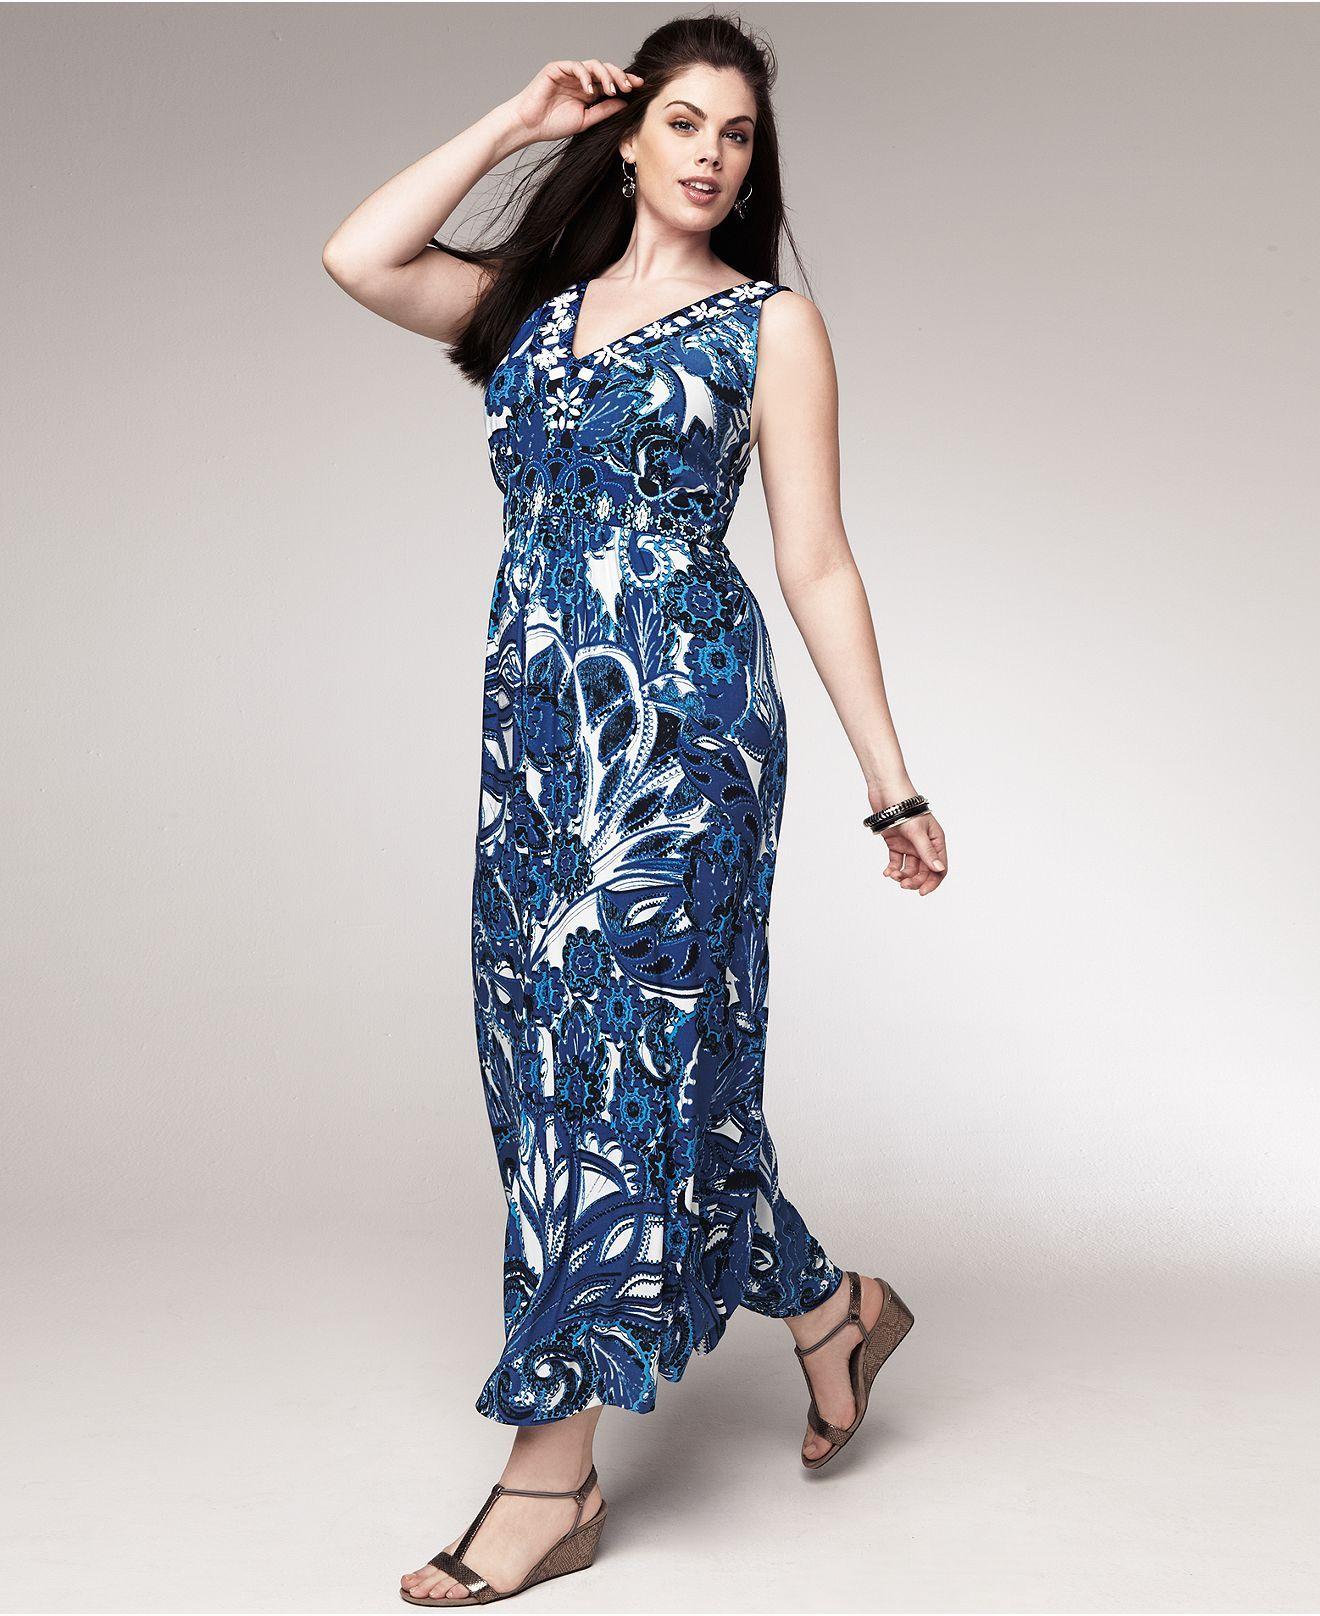 Style Plus Size Dress, Sleeveless Printed Maxi - Plus Size Dresses ...